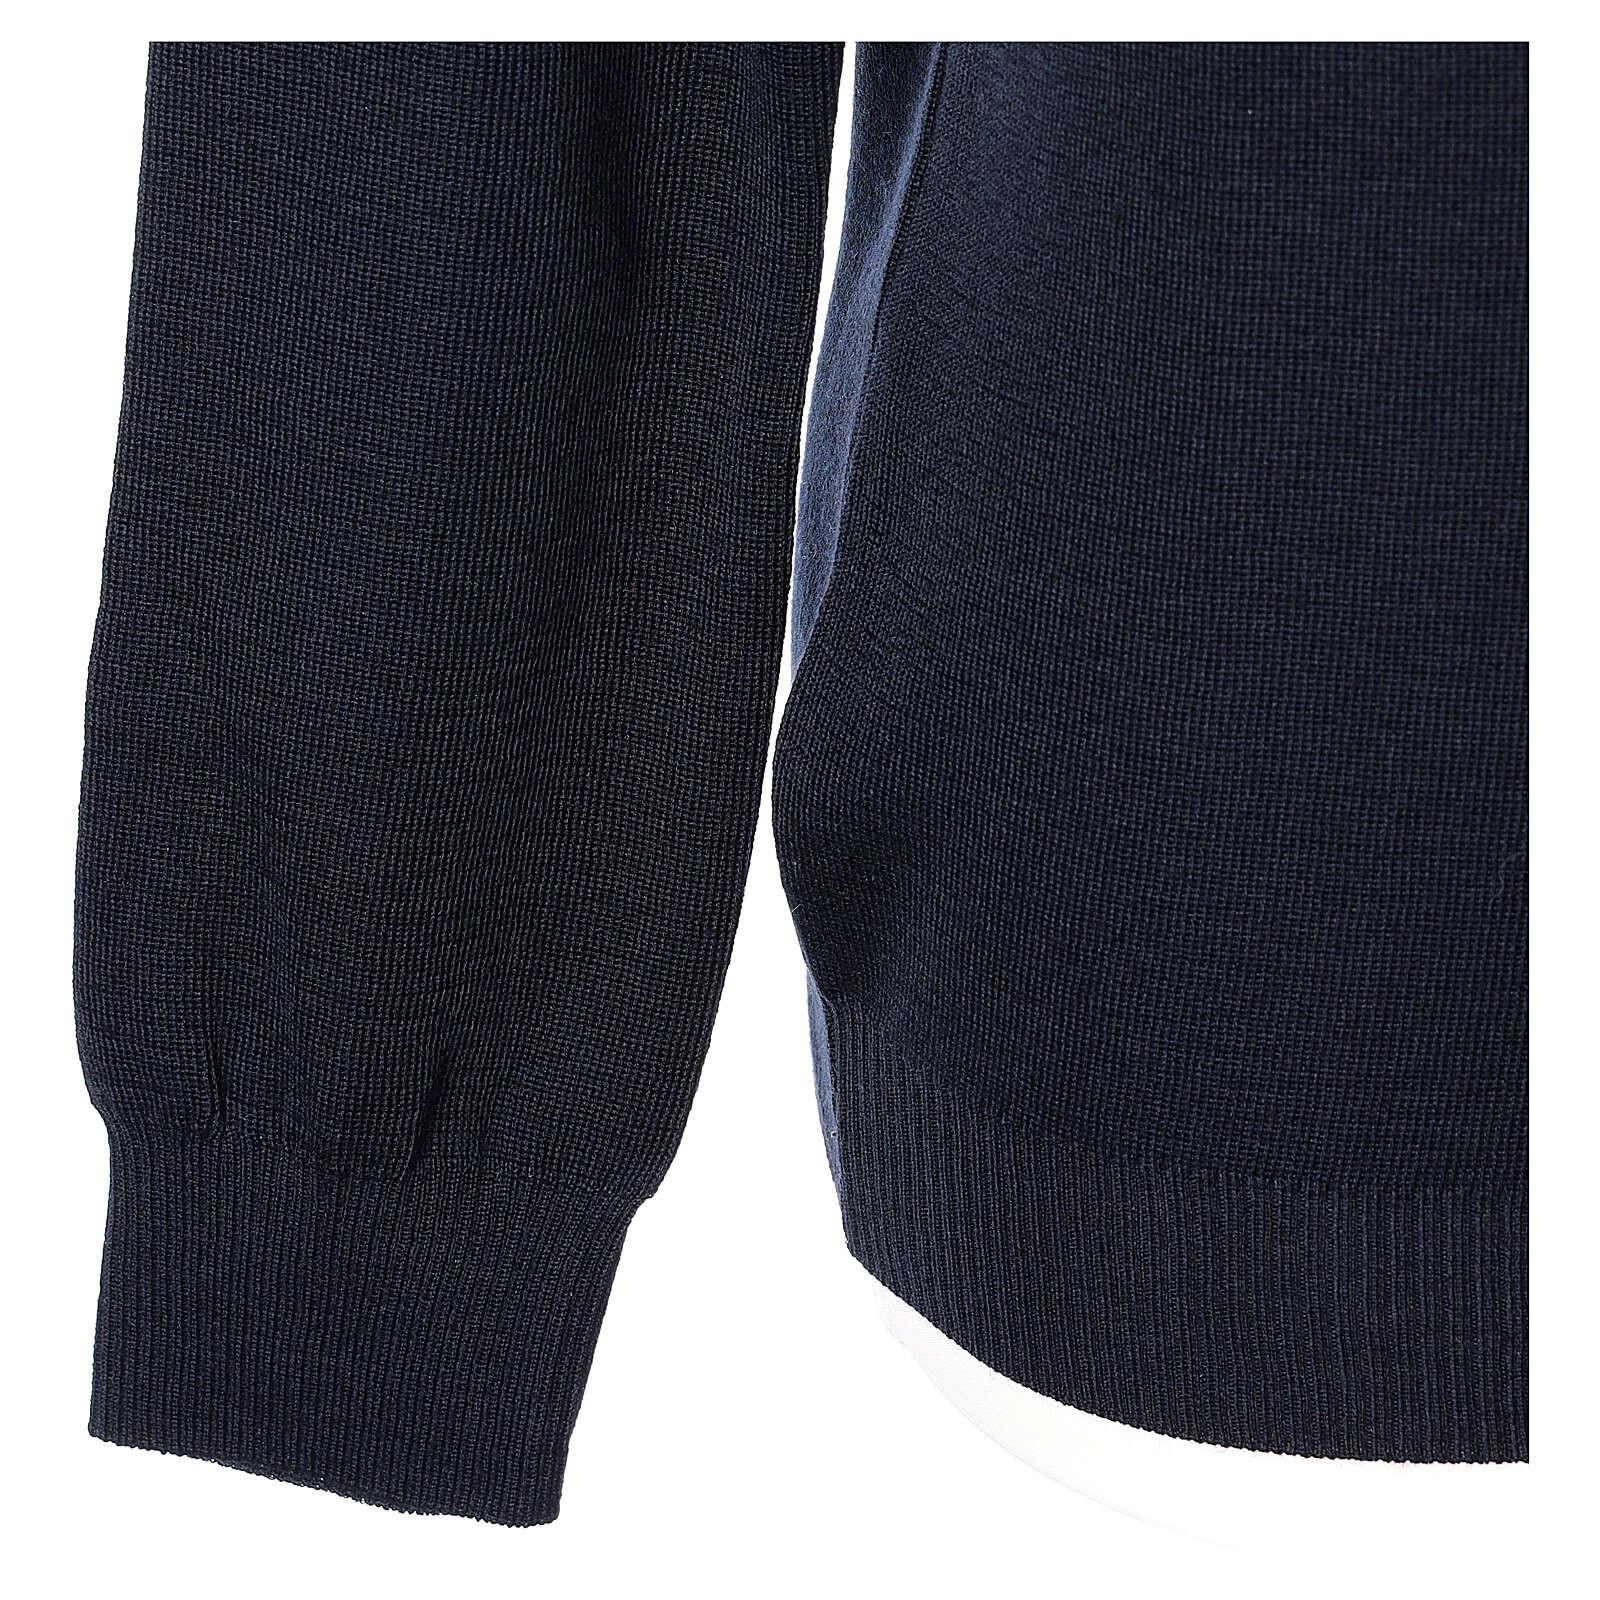 V-neck blue clergy jumper plain fabric 50% acrylic 50% merino wool 4